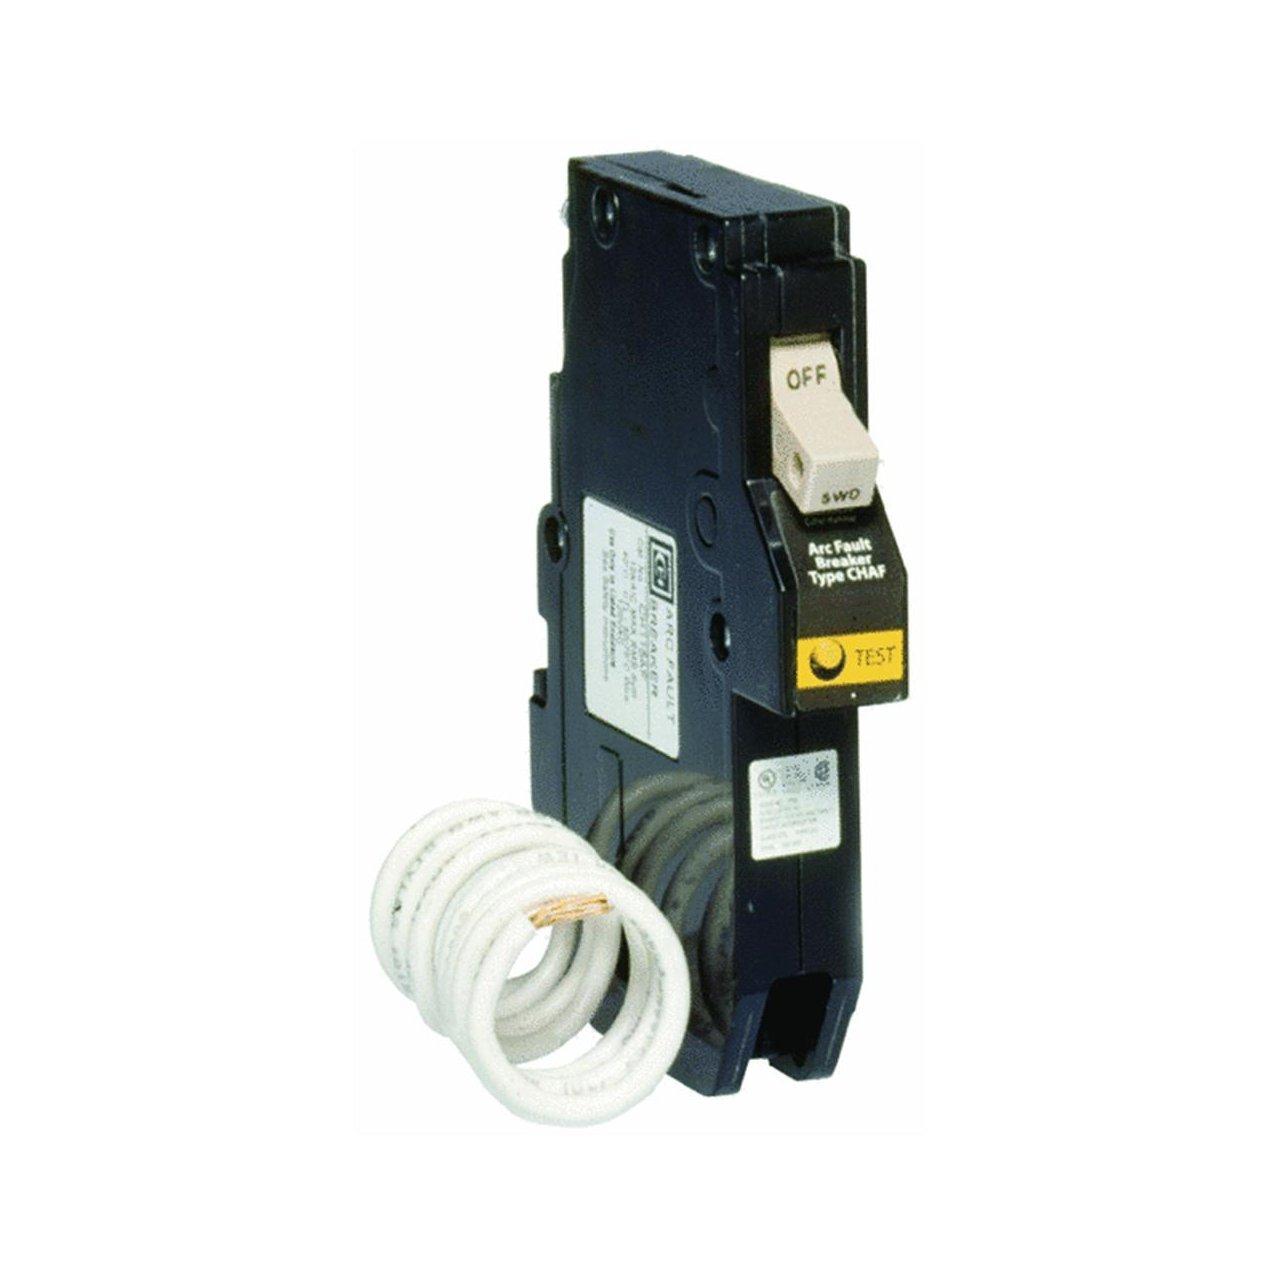 Eaton CH115AF Ch Series Single-Pole Arc Fault Breaker, 120 Vac, 15 Amp, 1' x 1' x 1' 1 x 1 x 1